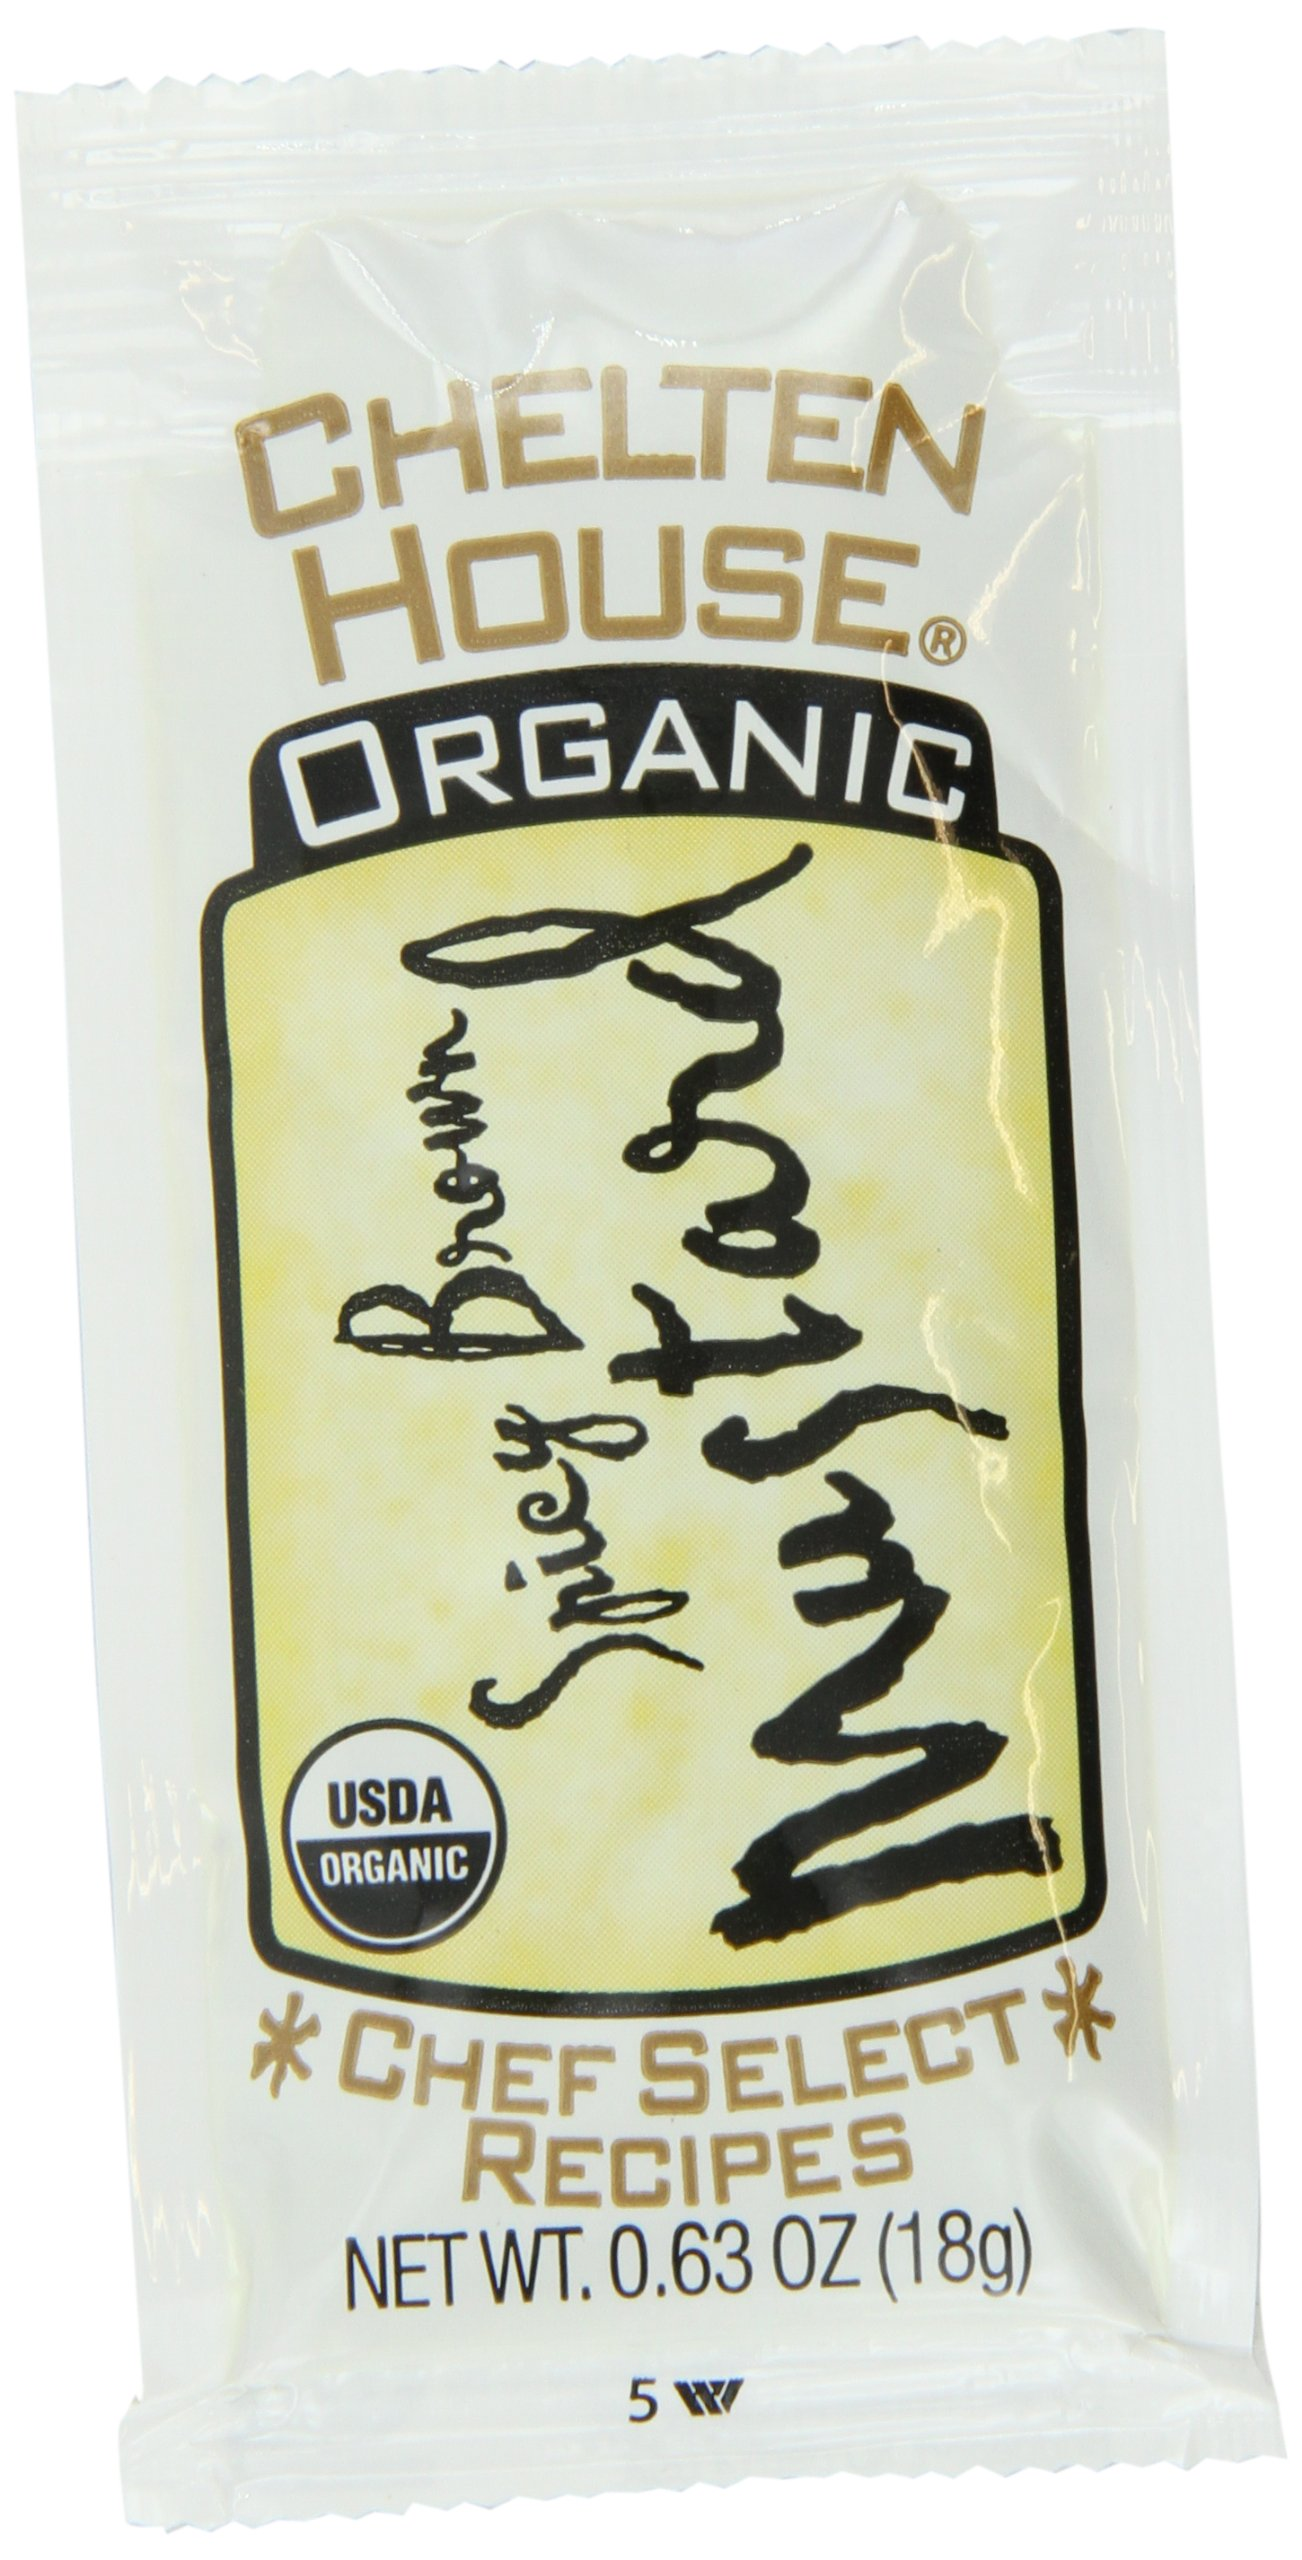 Chelten House Single Serve Portion Packs, Mustard, 0.63 Ounce (Pack of 250)